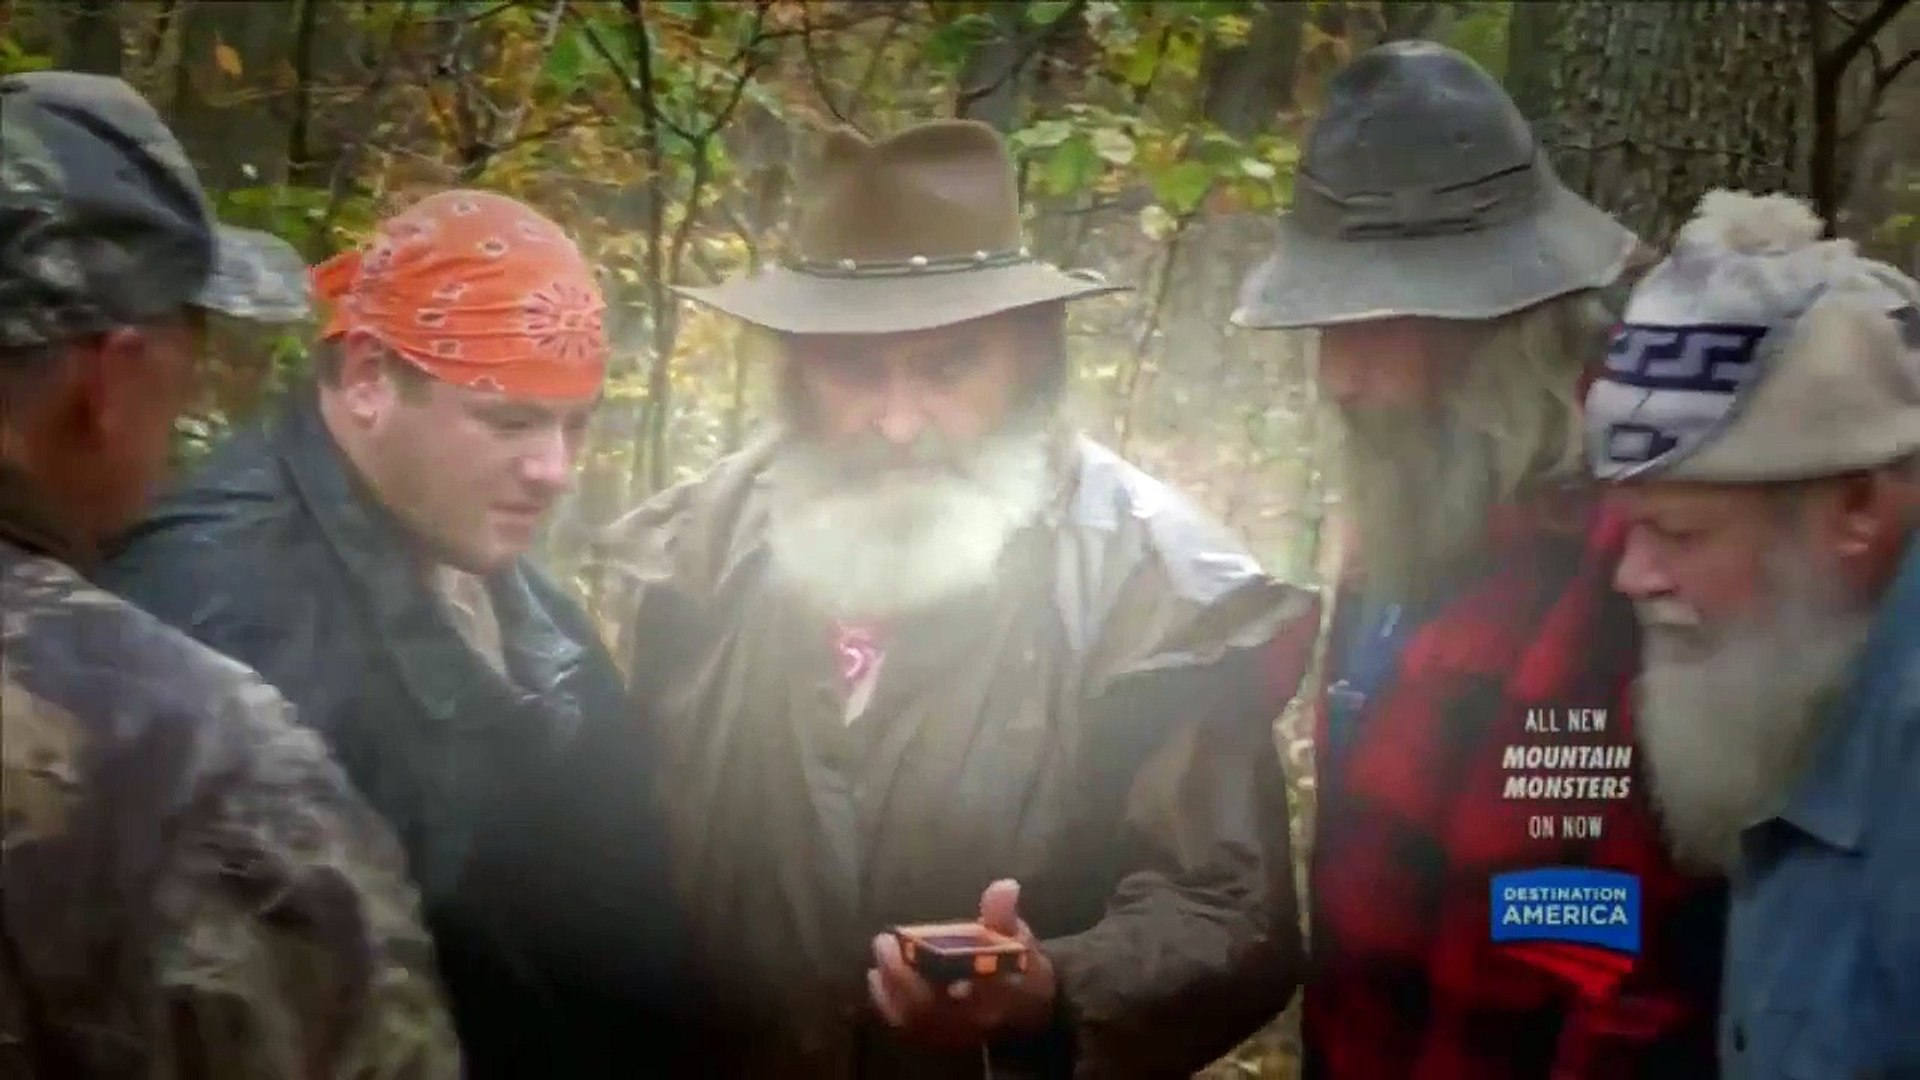 Mountain Monsters S03E06 Bigfoot of Washington County